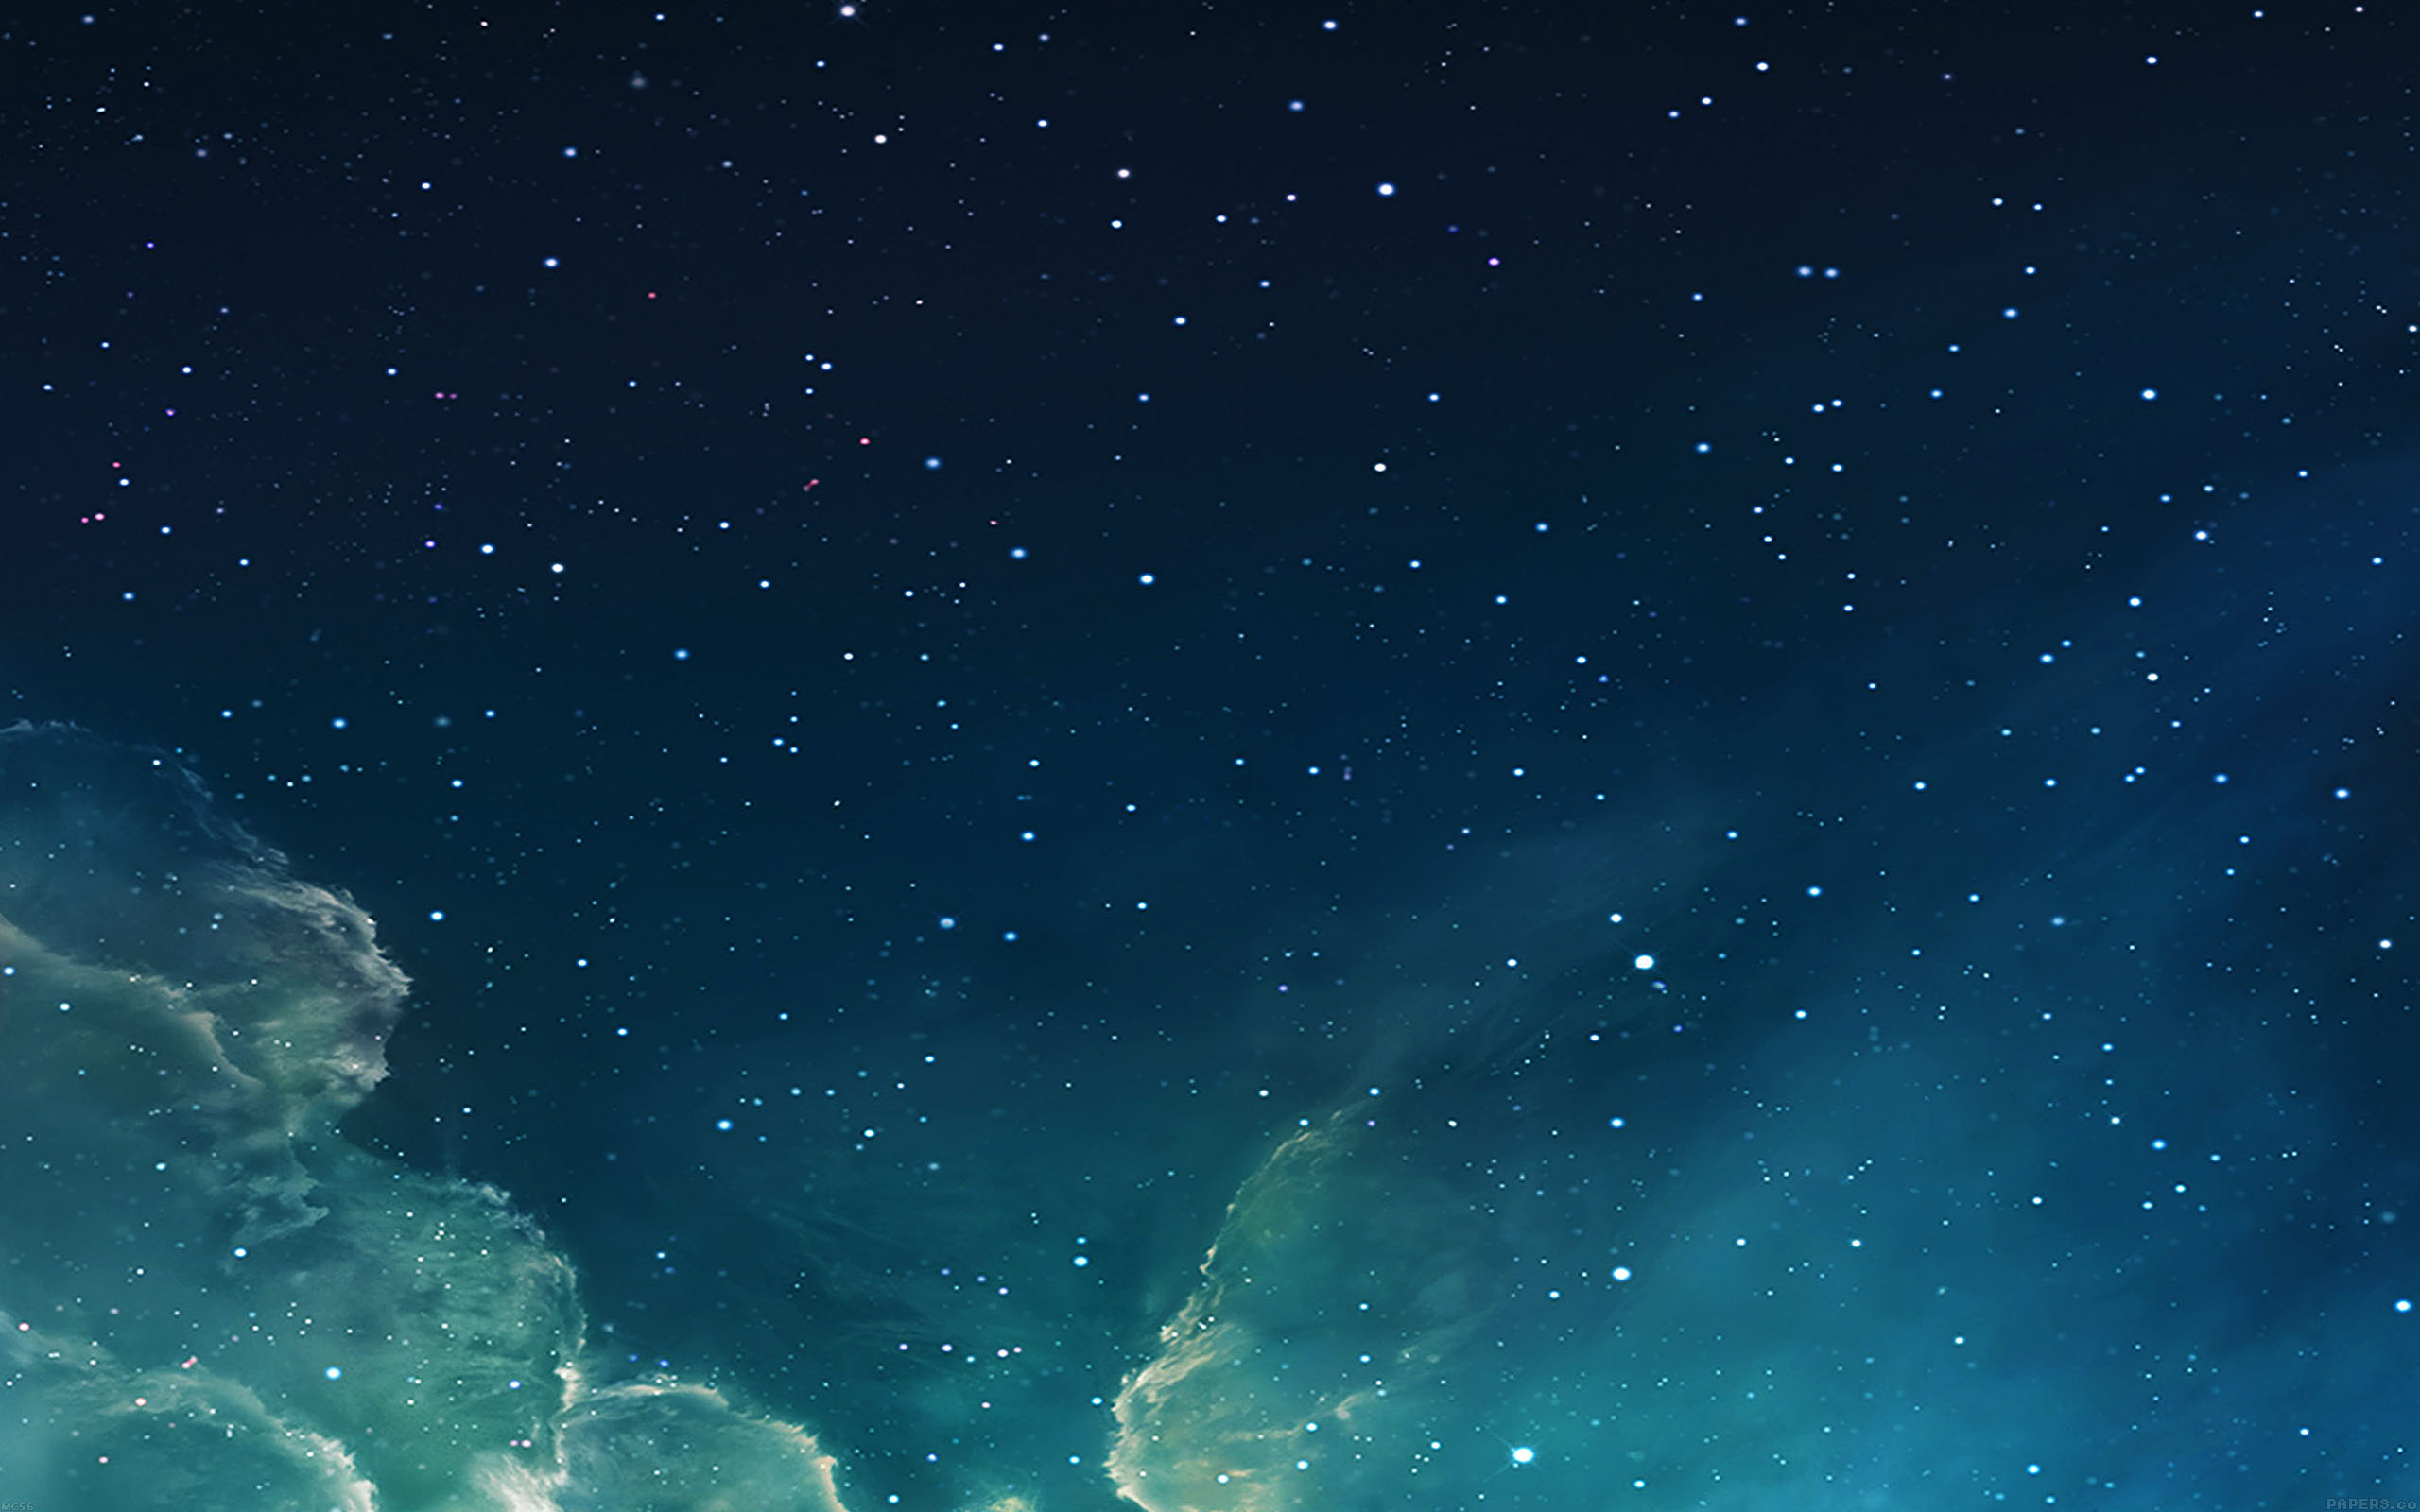 Hd Wallpapers For Nexus 5 Mc56 Wallpaper Galaxy Blue 7 Starry Star Sky Wallpaper